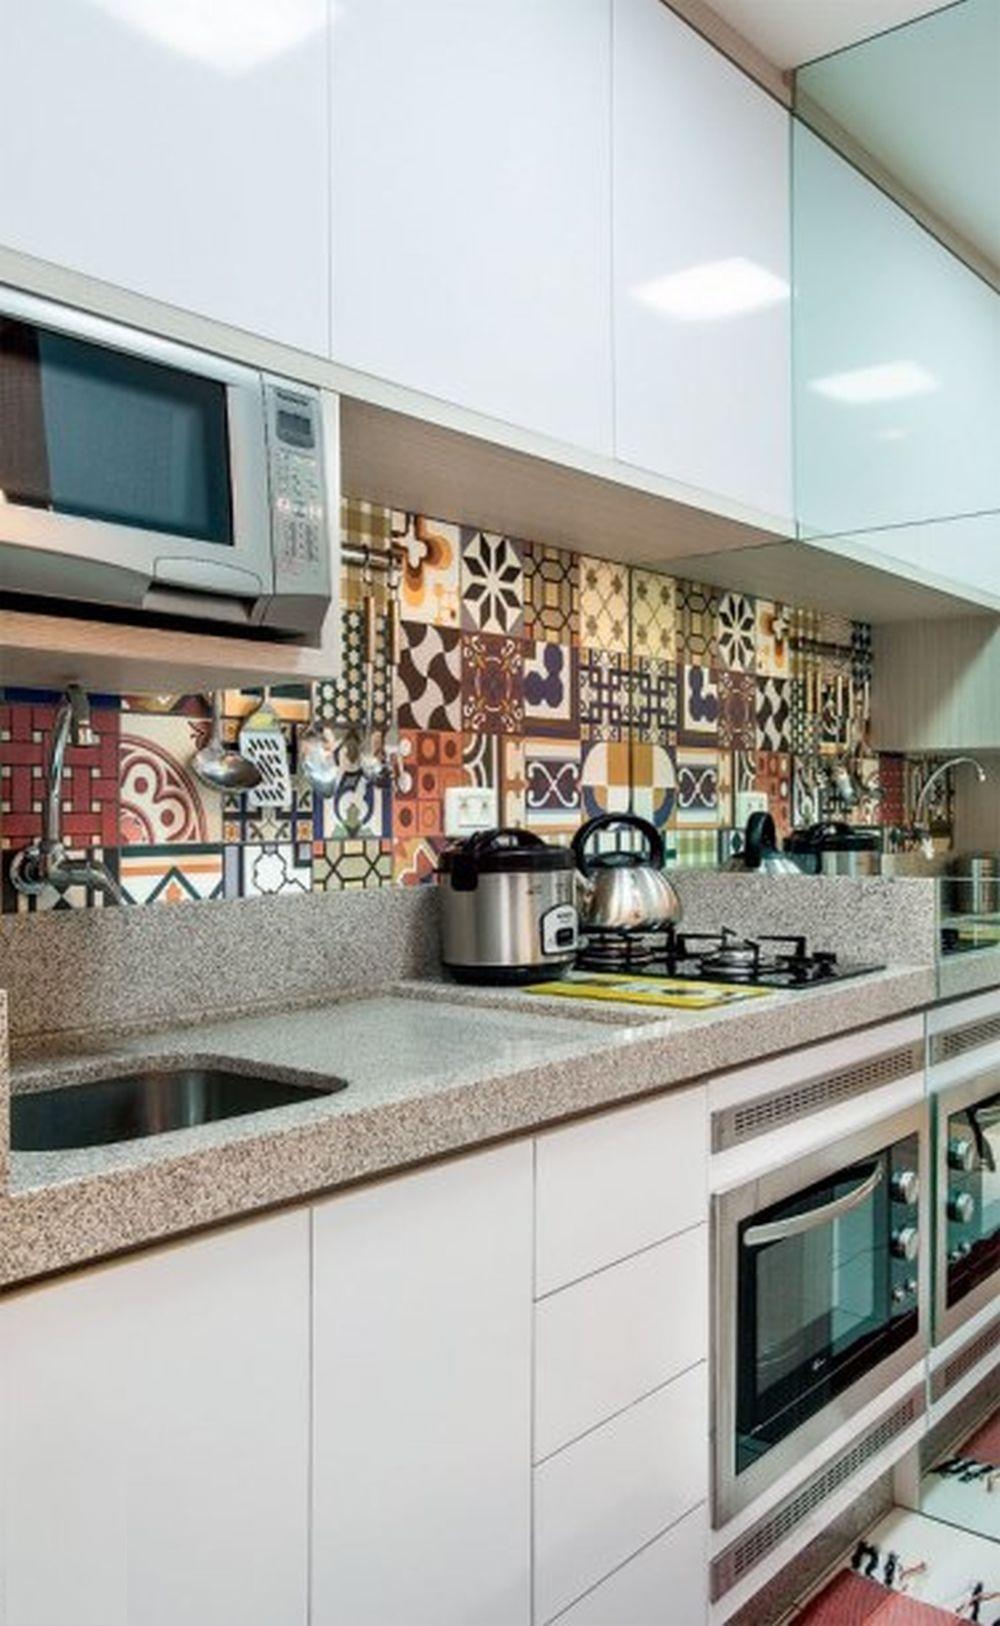 adelaparvu.com despre apartament 37 mp cu 2 dormitoare, Brazilia, design Only Design de Interiores, Foto Jefferson Ohara (4)